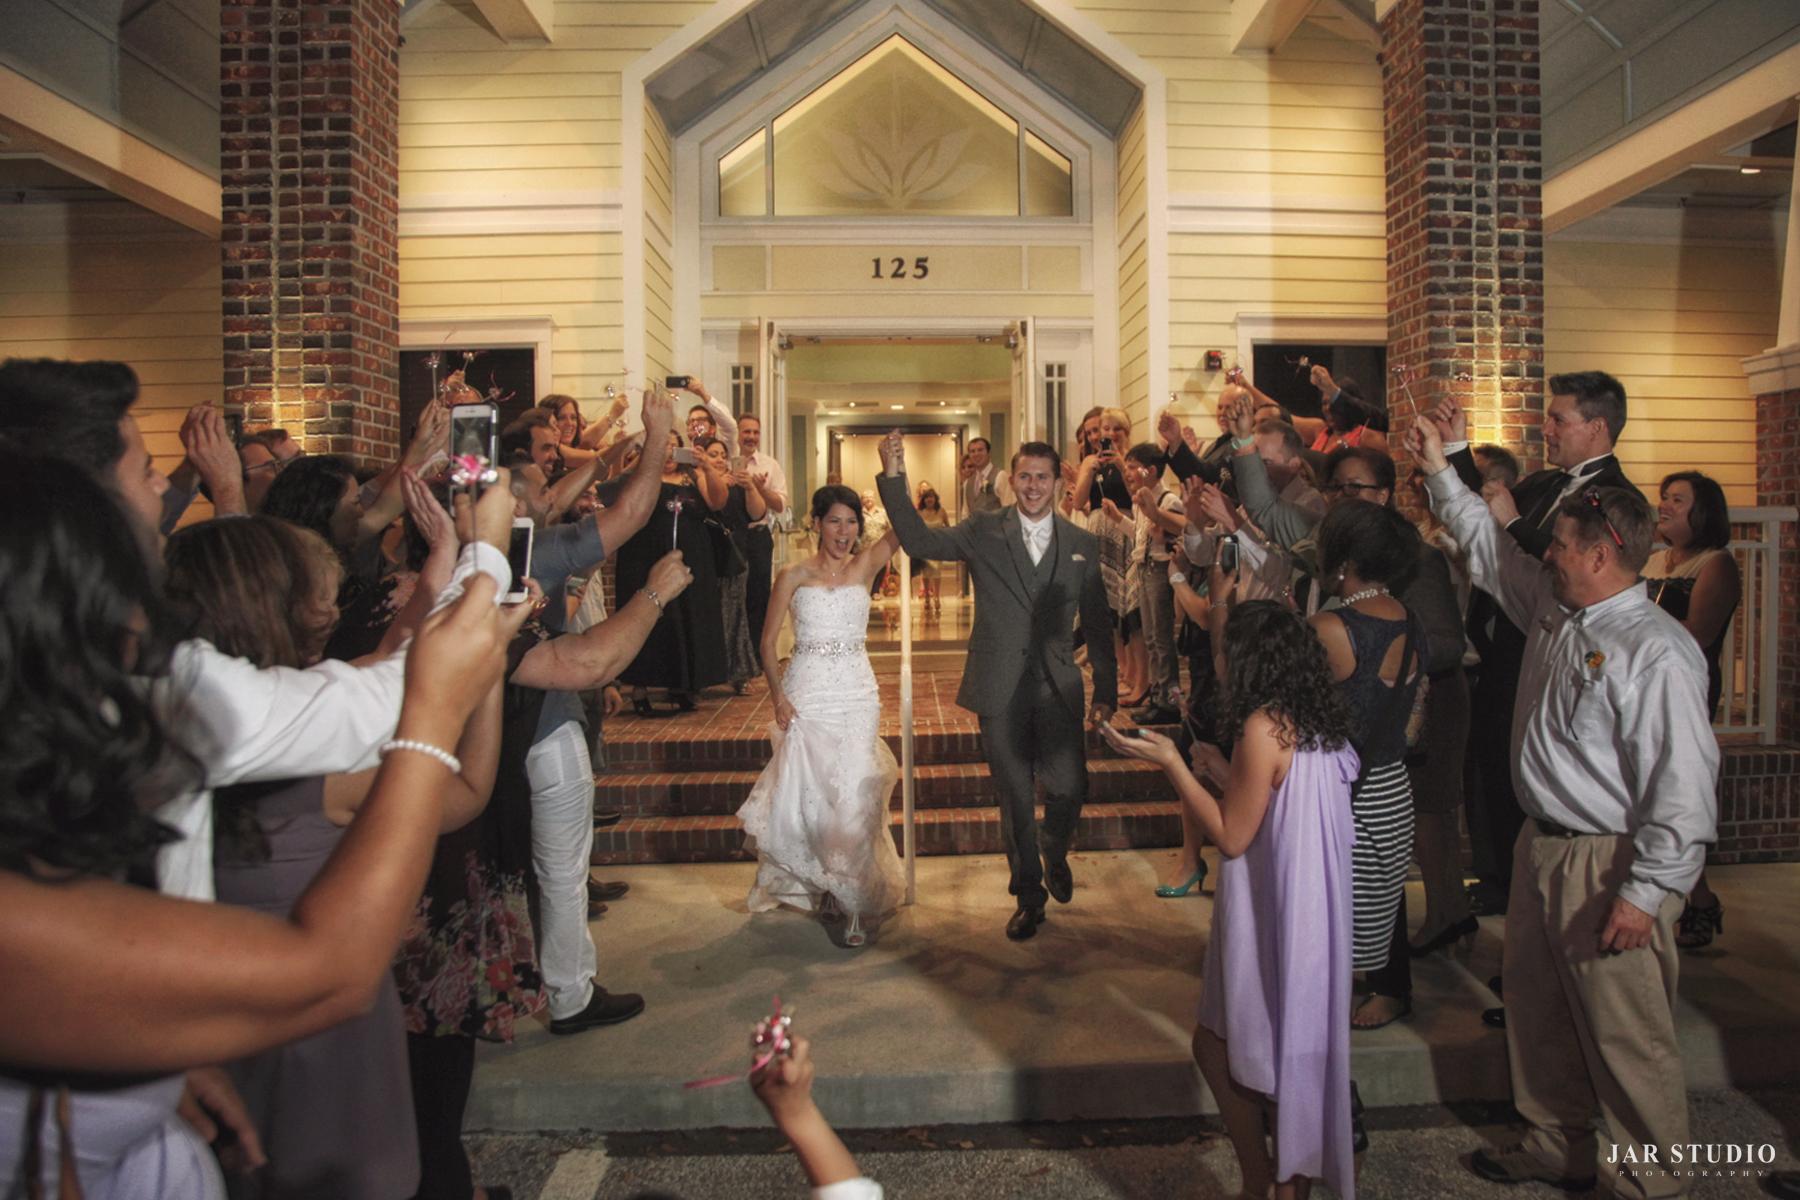 z-Lakeshore-Center-wedding-photographer-jarstudio (6).JPG